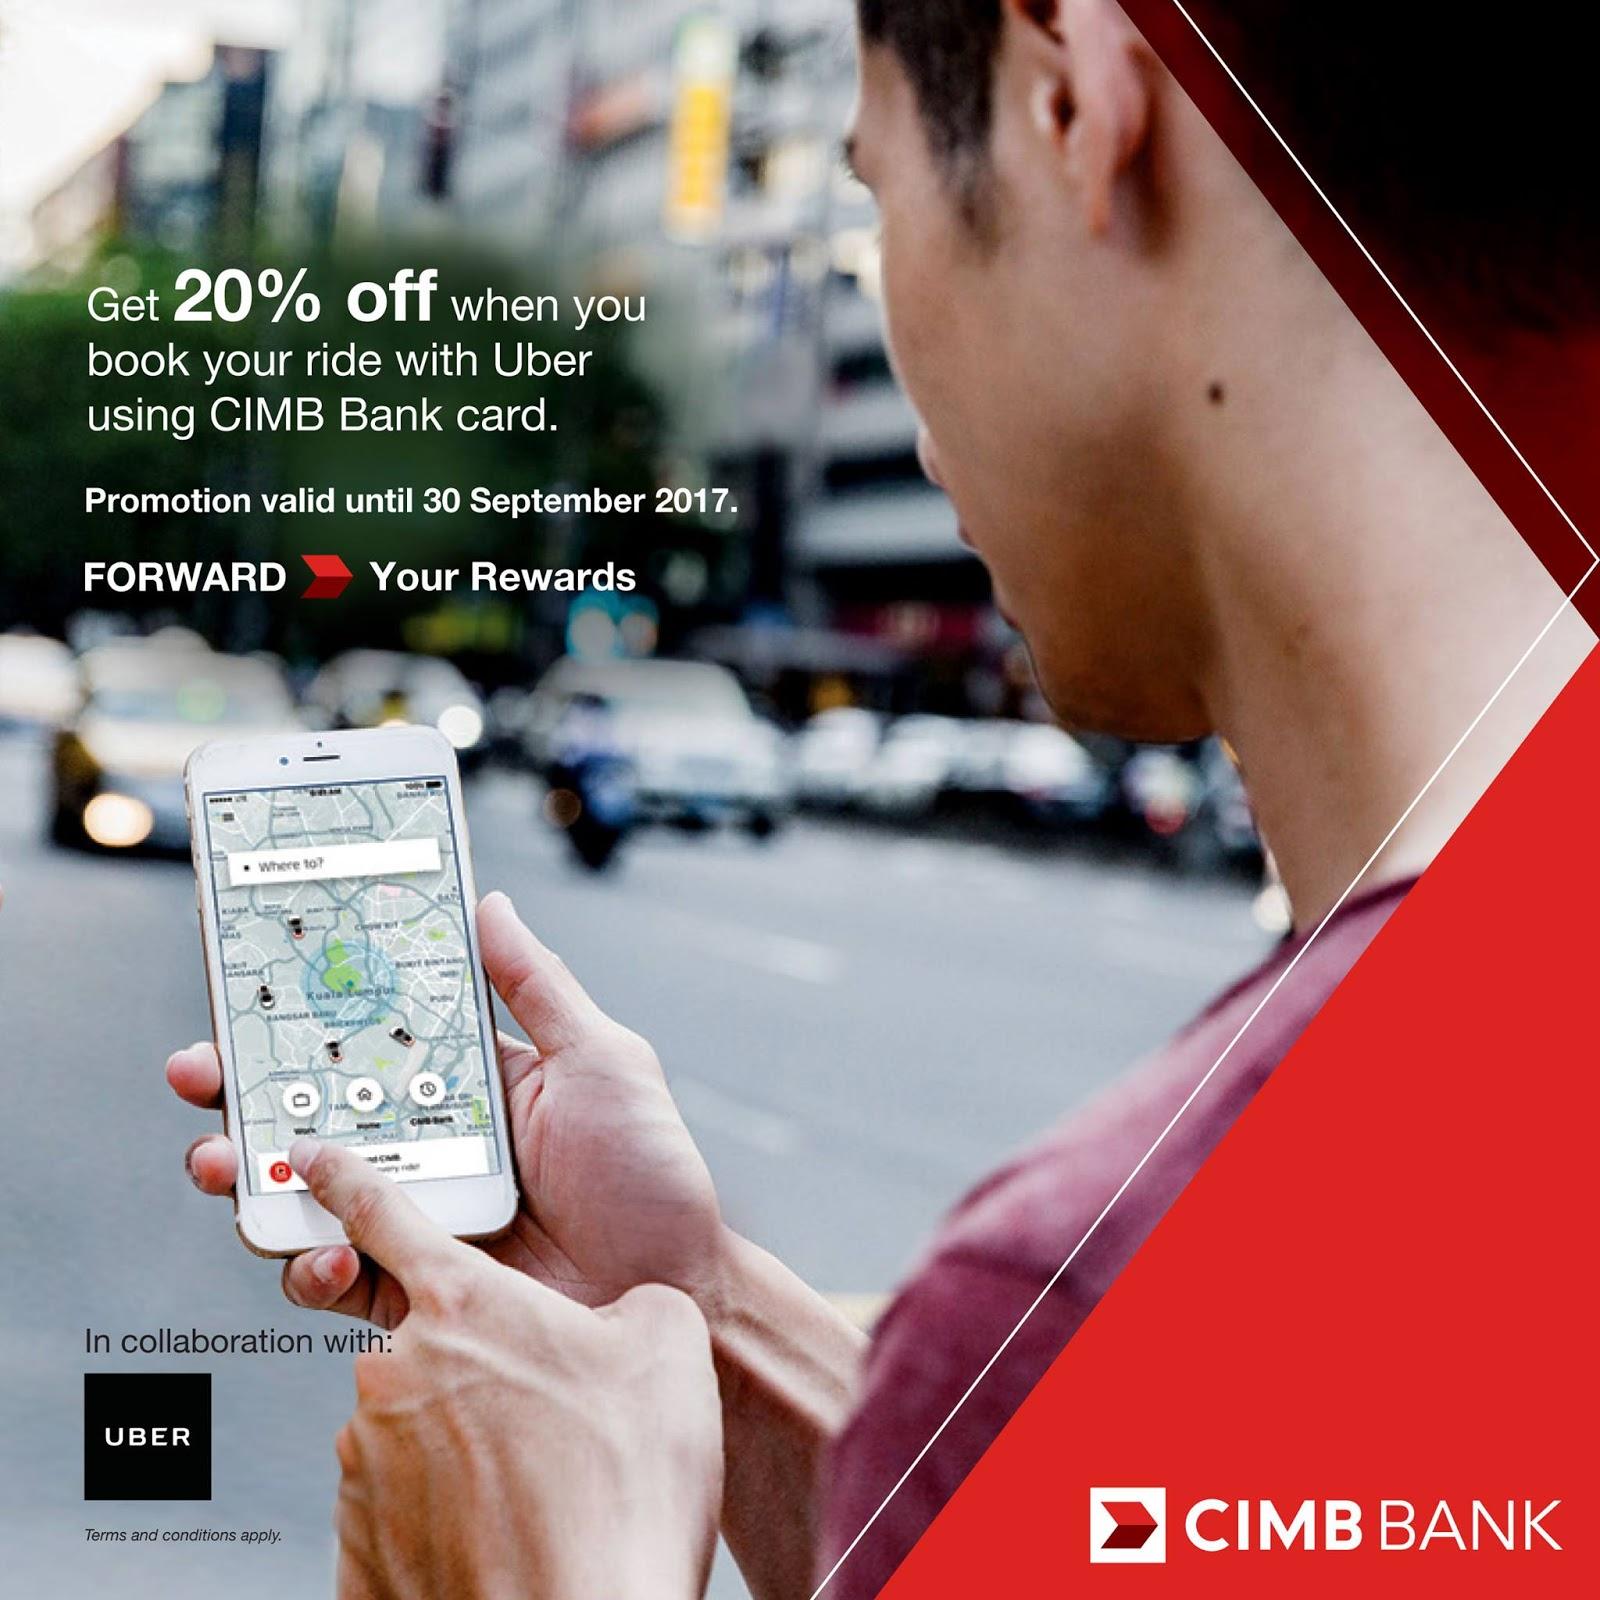 Uber Promo Code 20% Discount x 20 Rides Using CIMB Bank